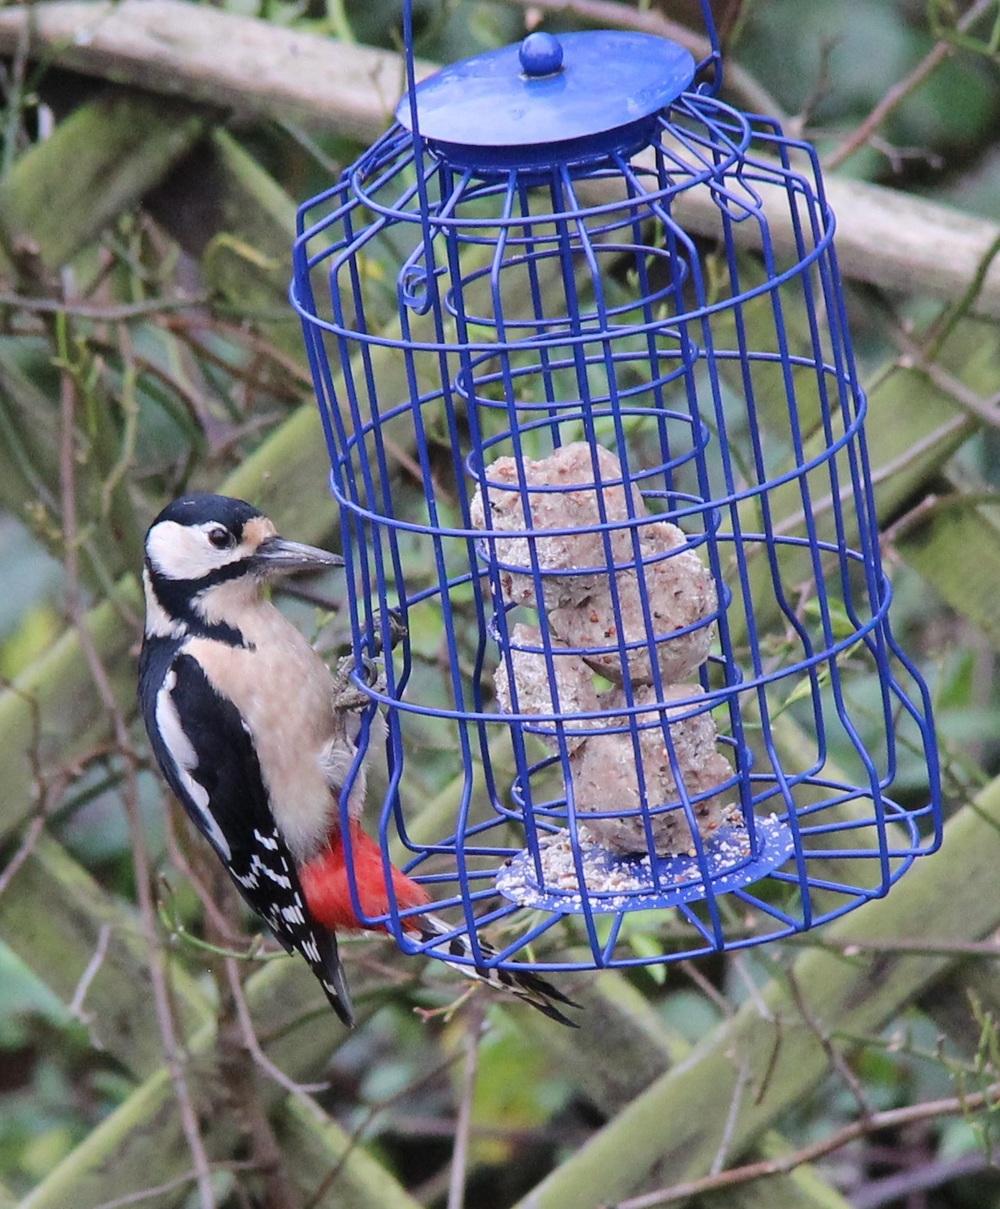 A great spotted woodpecker in my garden!